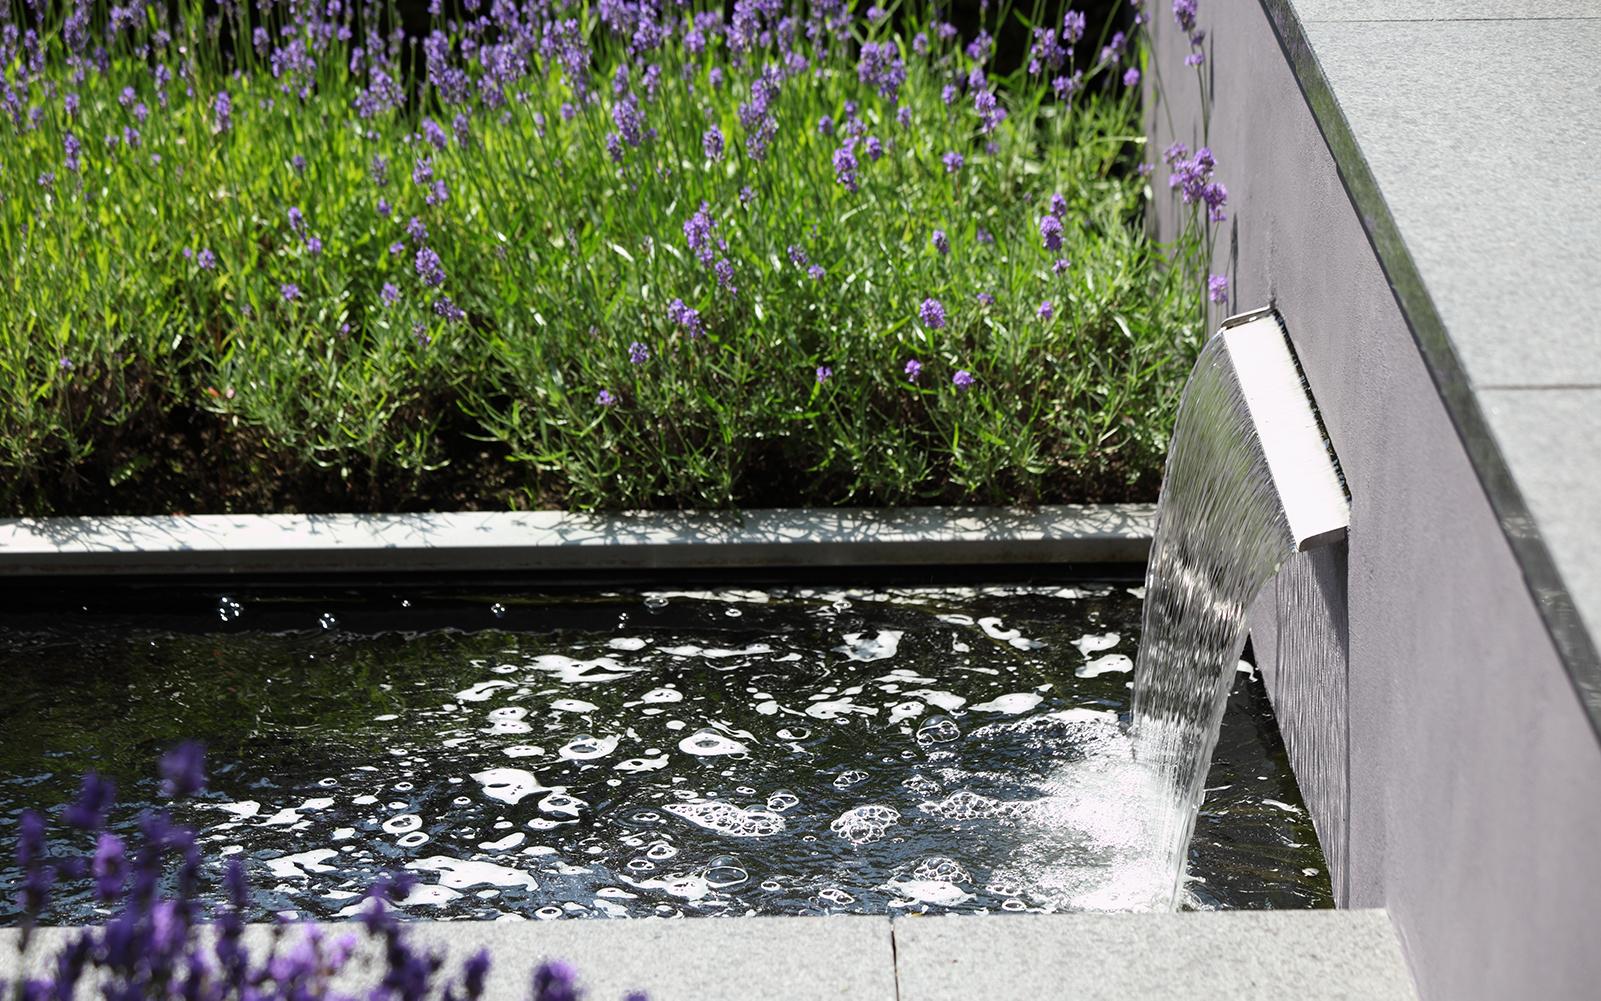 Stoop tuinen, groene tuin. sfeervol en strak, tuinarchitectuur